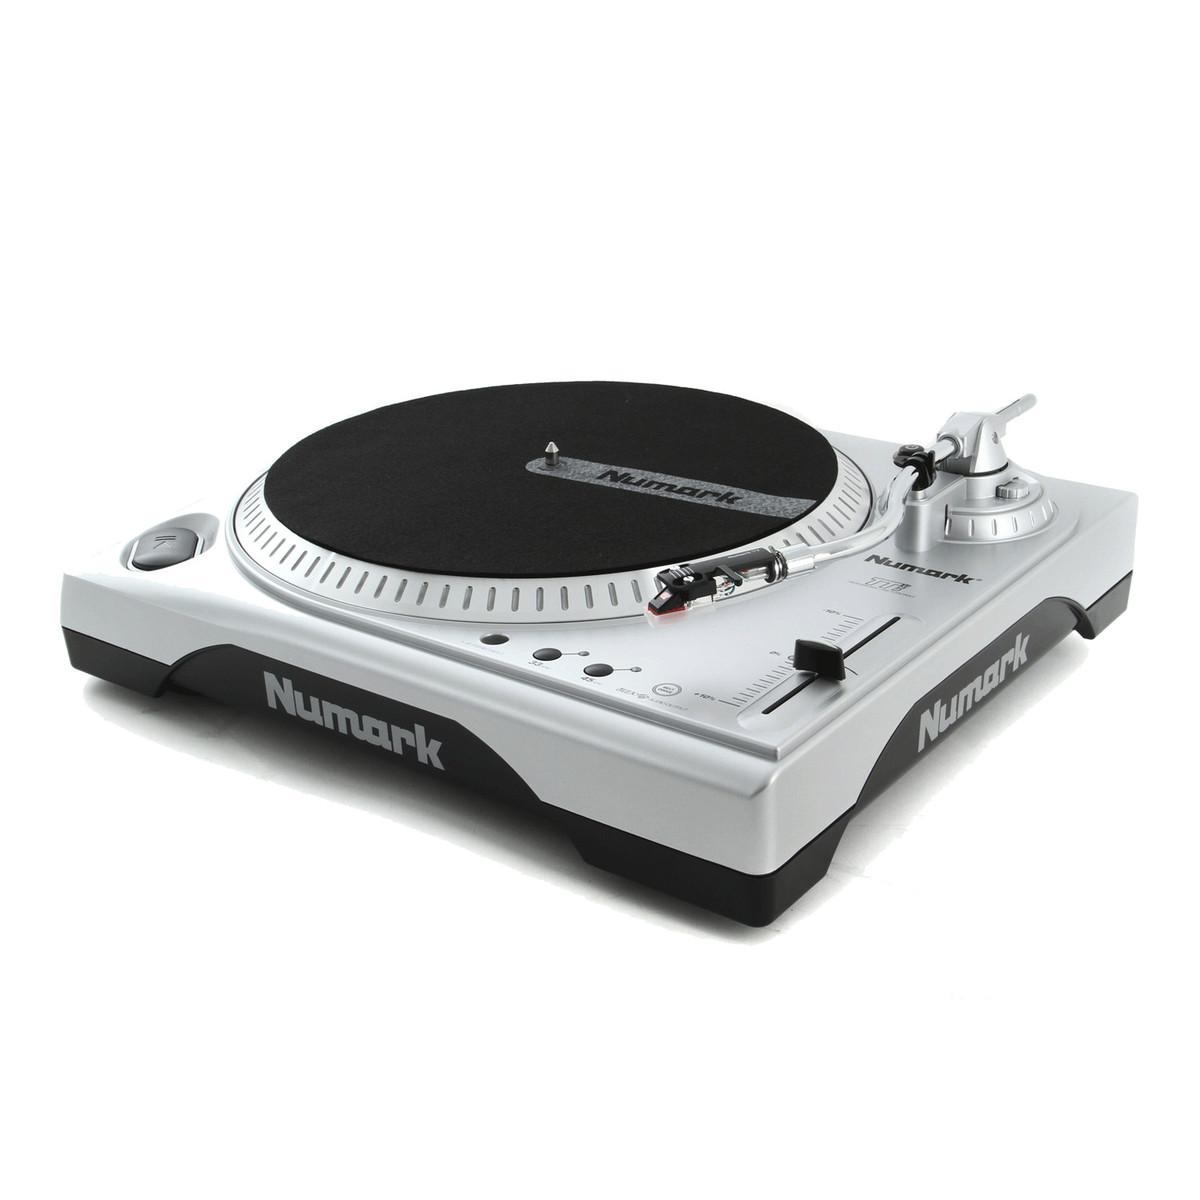 Numark Tt Usb Giradischi Con Usb Audio Gear4music